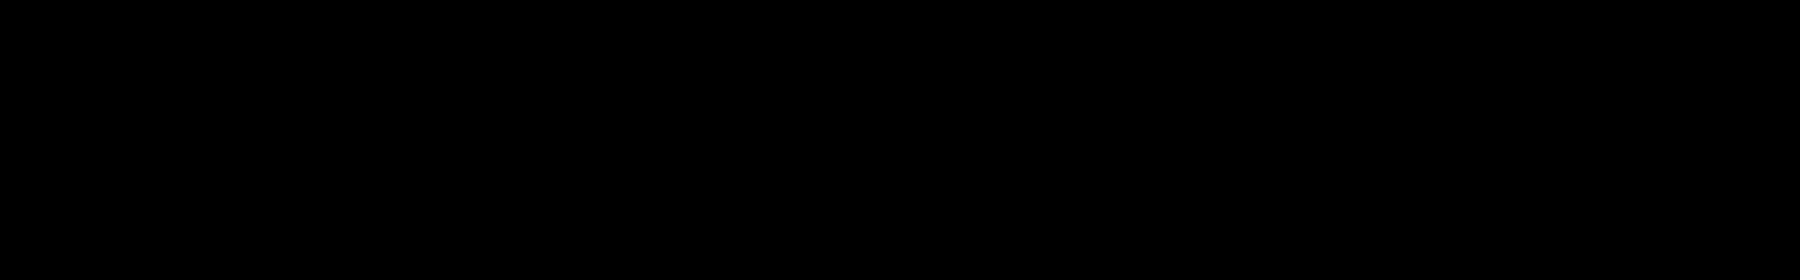 CALVIN audio waveform